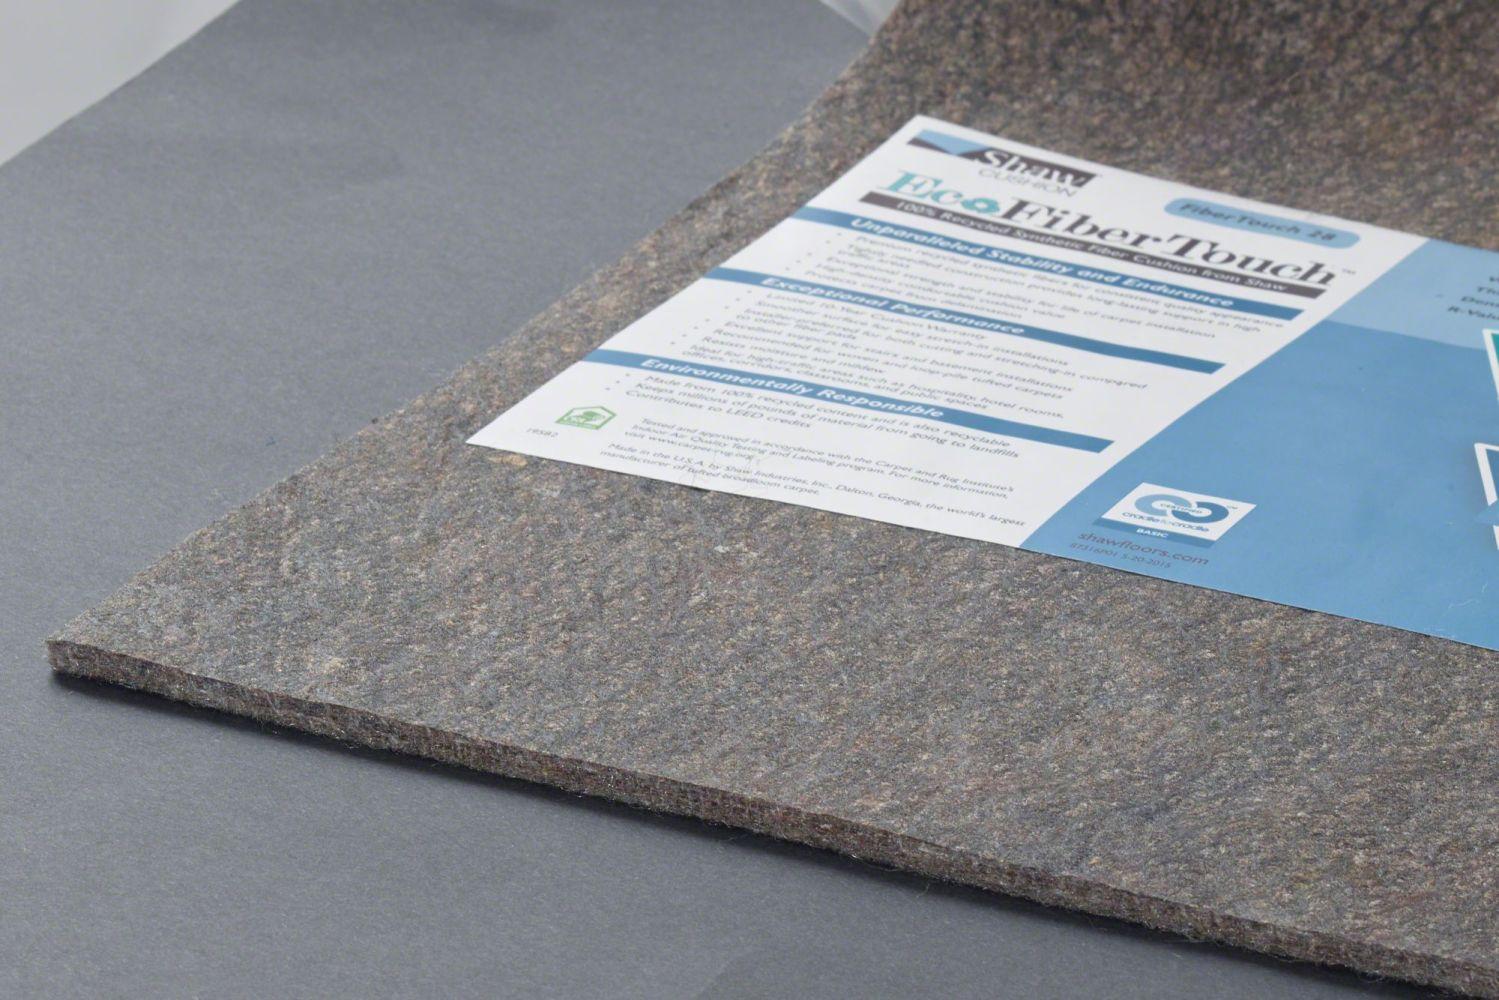 Shaw Floors Eco Edge Cushion Fibertouch 28-12 Grey 00001_283FT